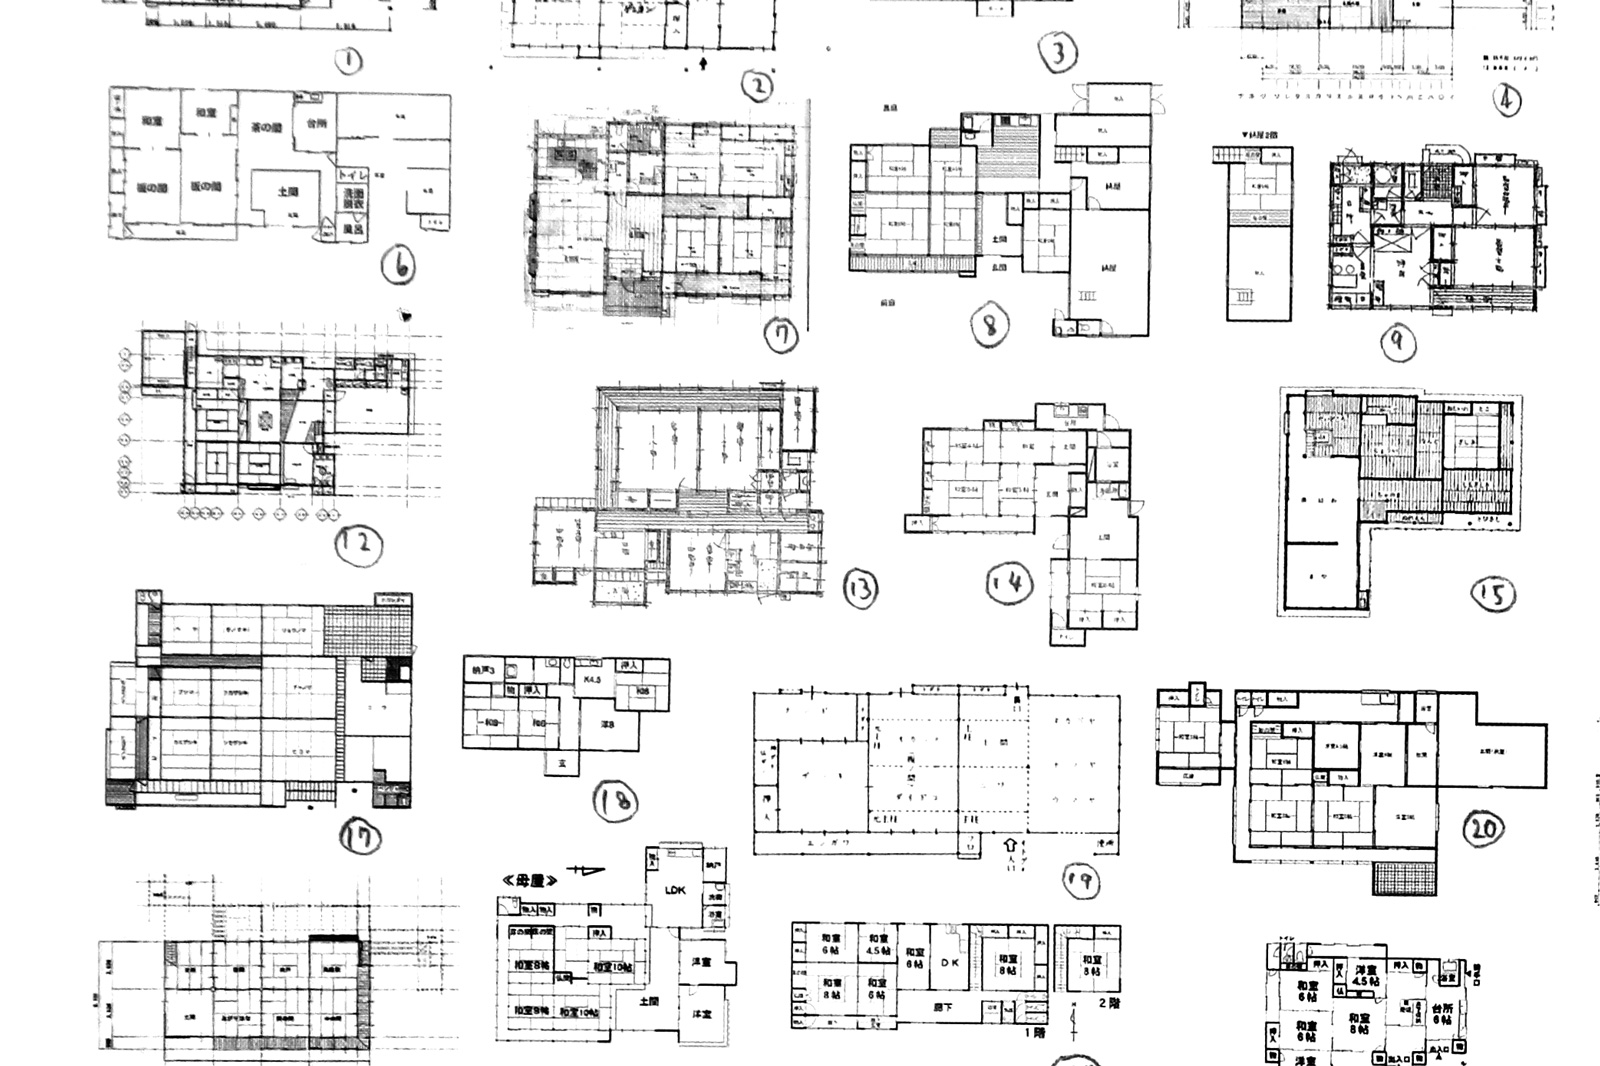 junya-ishigami-housing-for-elderly-small-multiples-plans